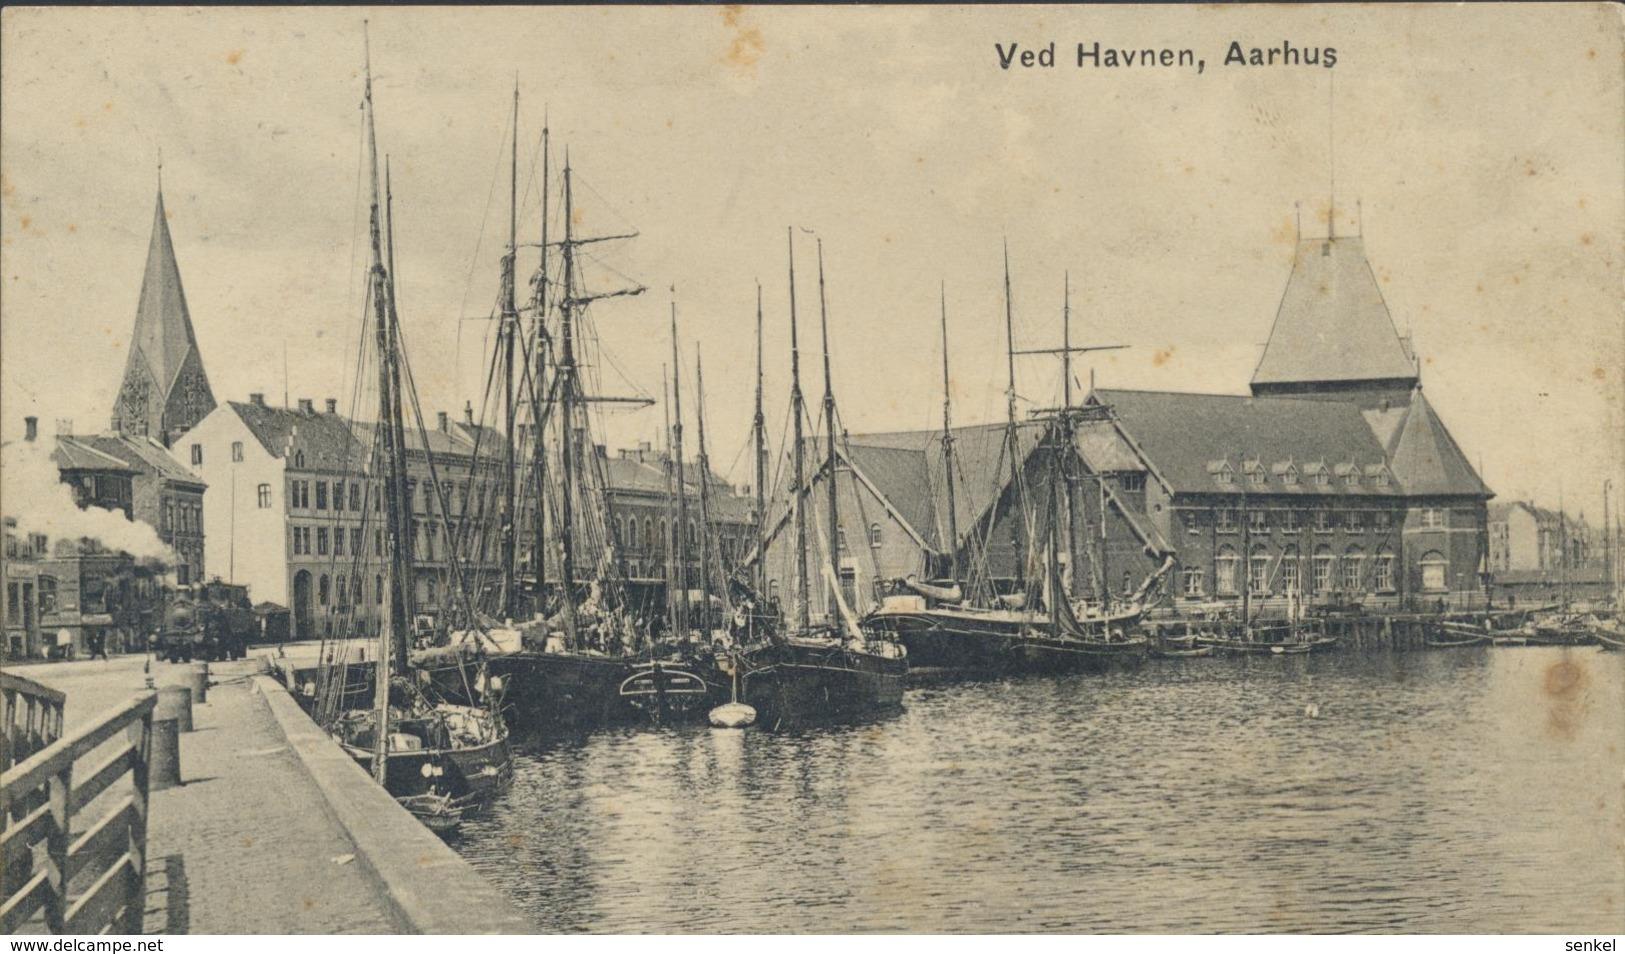 61-635 Denmark Dänemark Aarhus Ved Havnen - Dinamarca